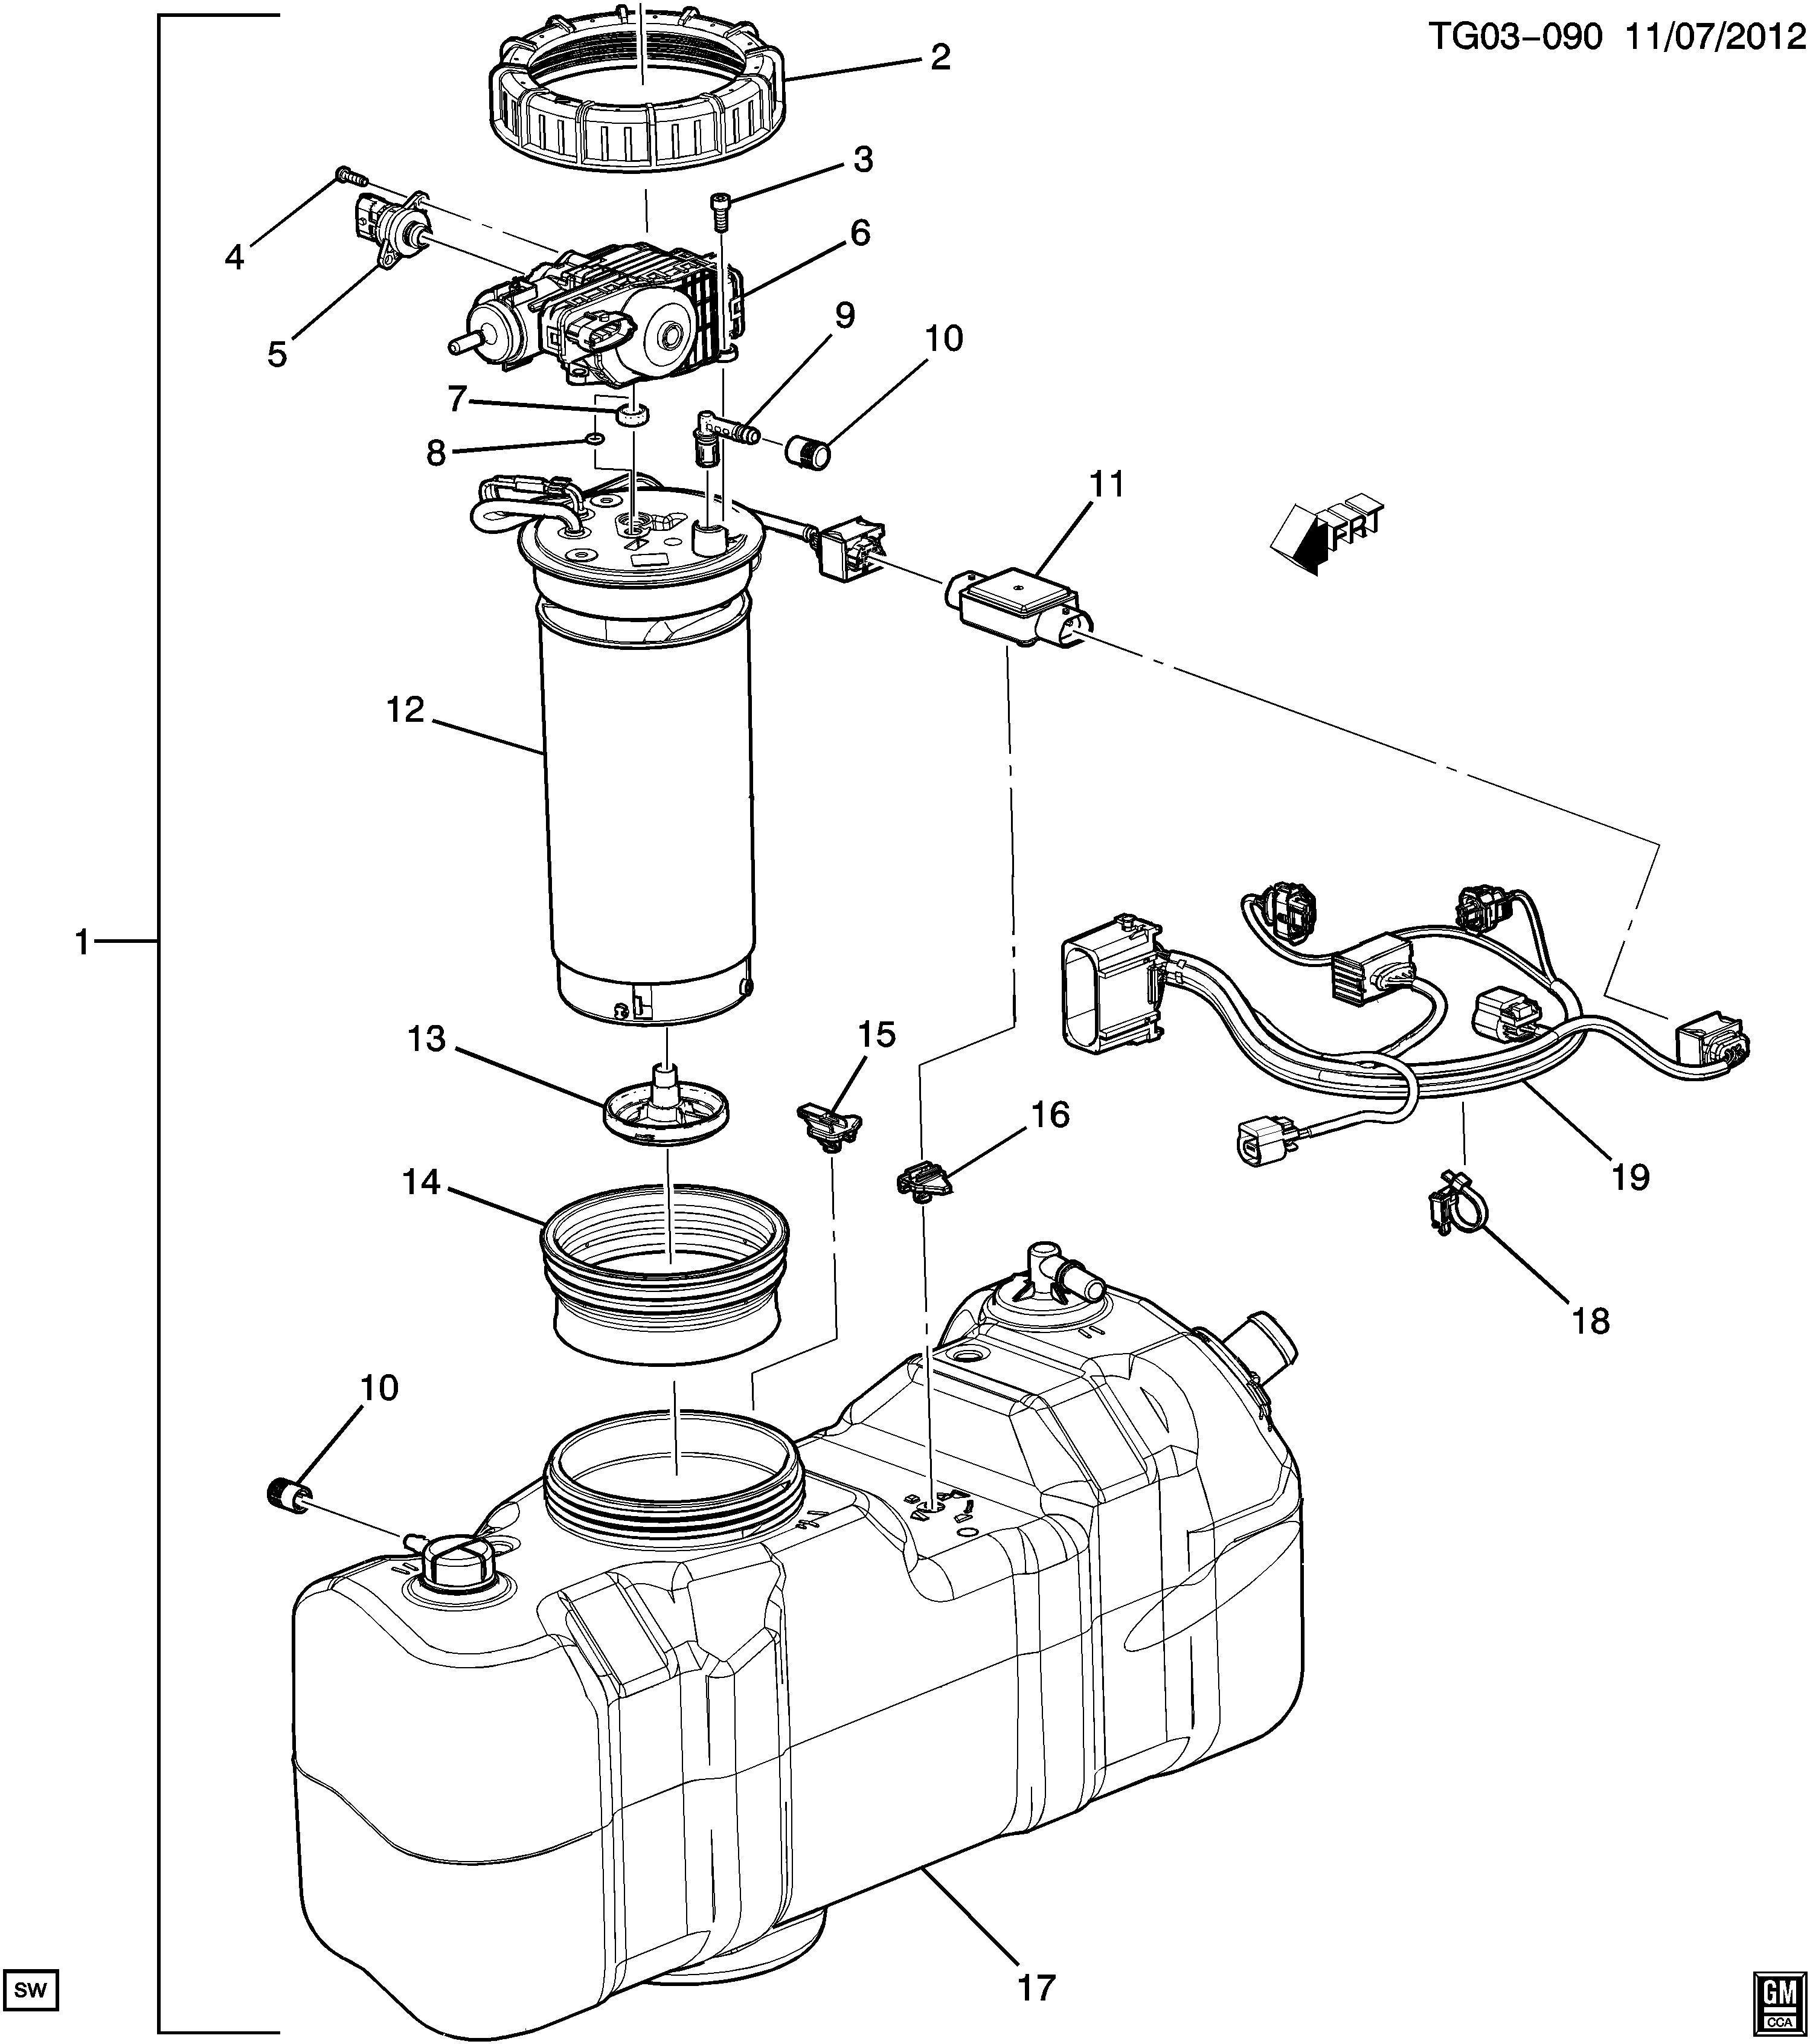 [DIAGRAM] 94 Gmc Fuel Pump Diagram FULL Version HD Quality